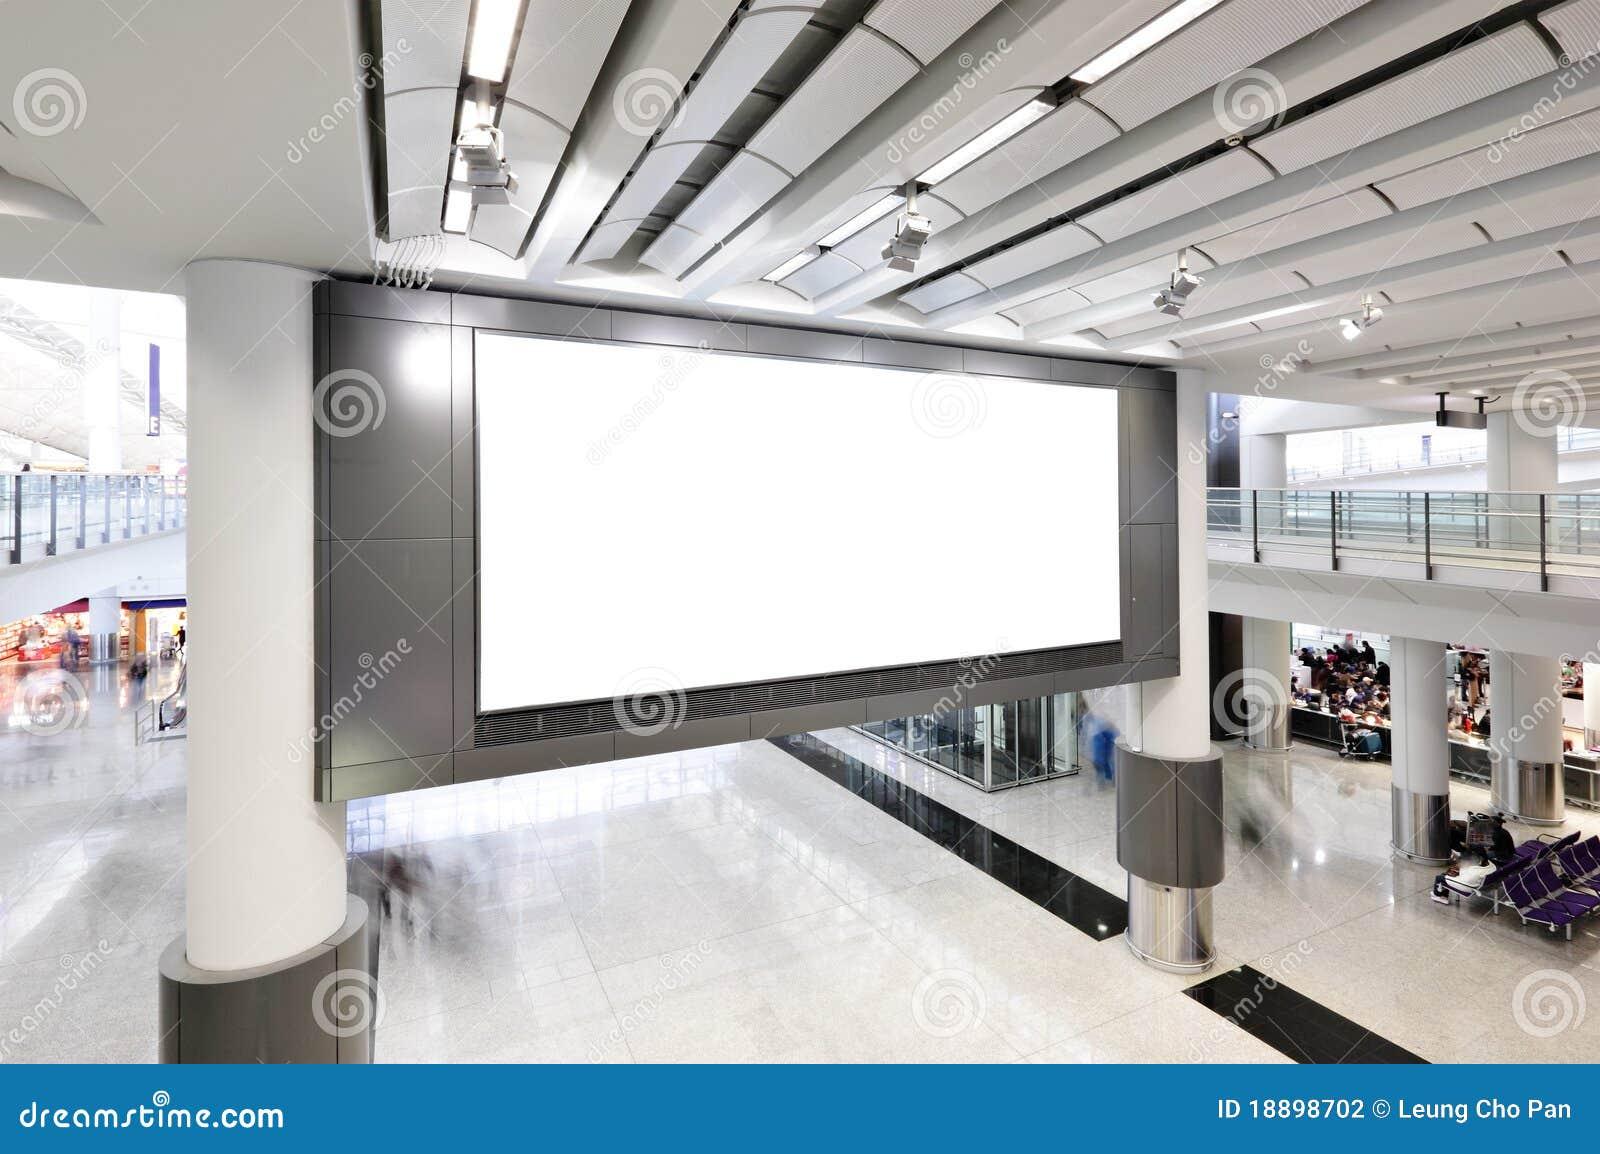 Blank Billboard Indoor Stock Photography Image 18898702